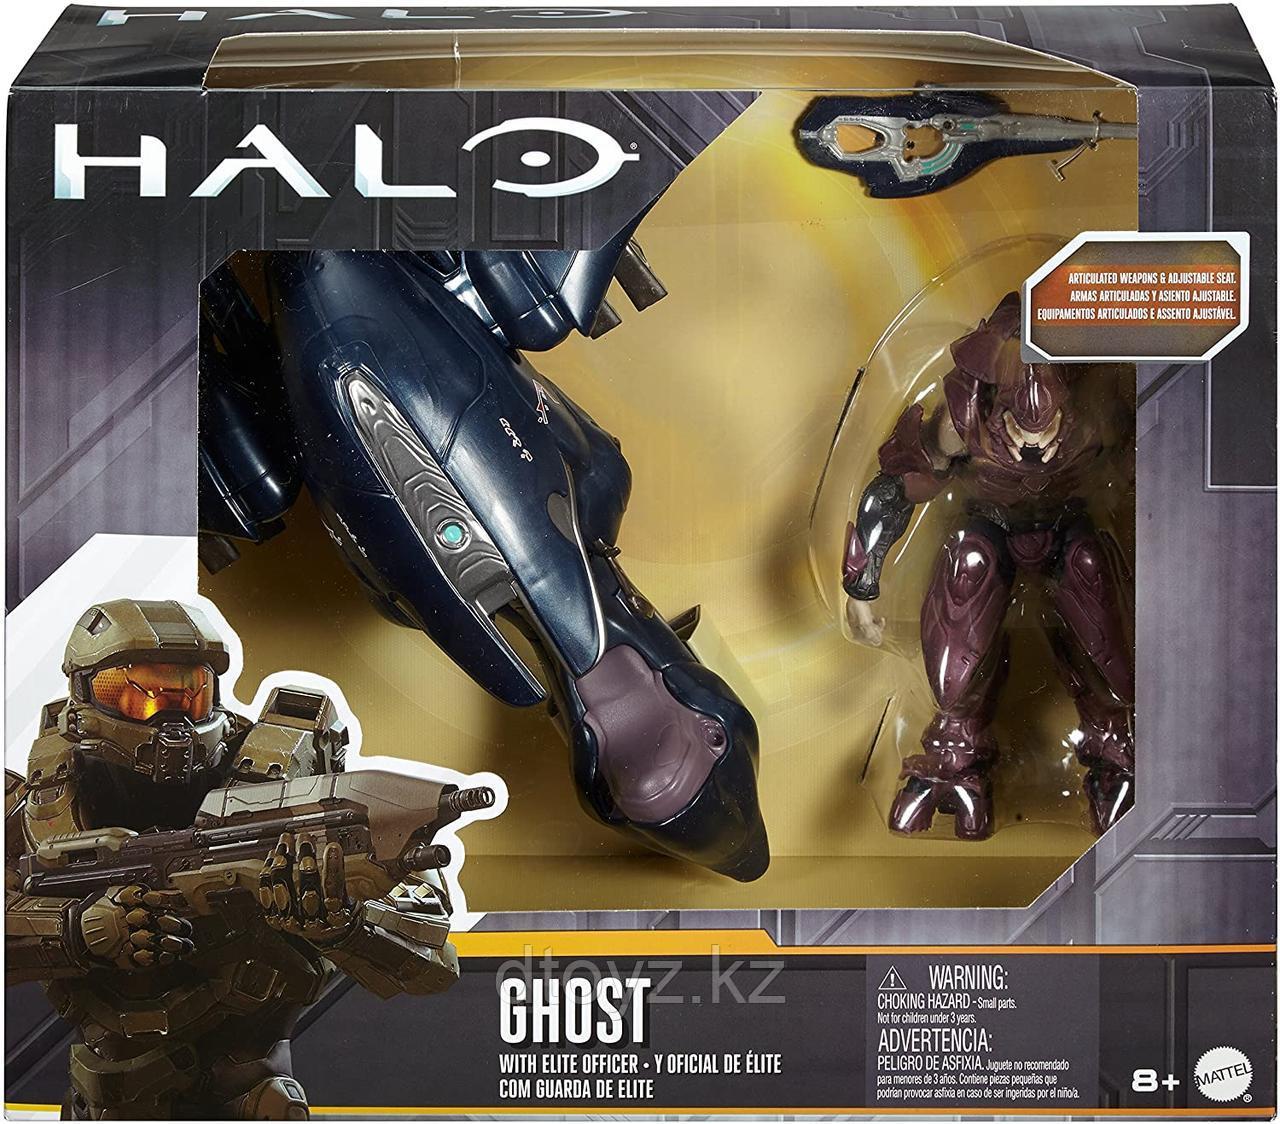 Halo 6 Ghost Vehicle и Элитный офицер. DNT97